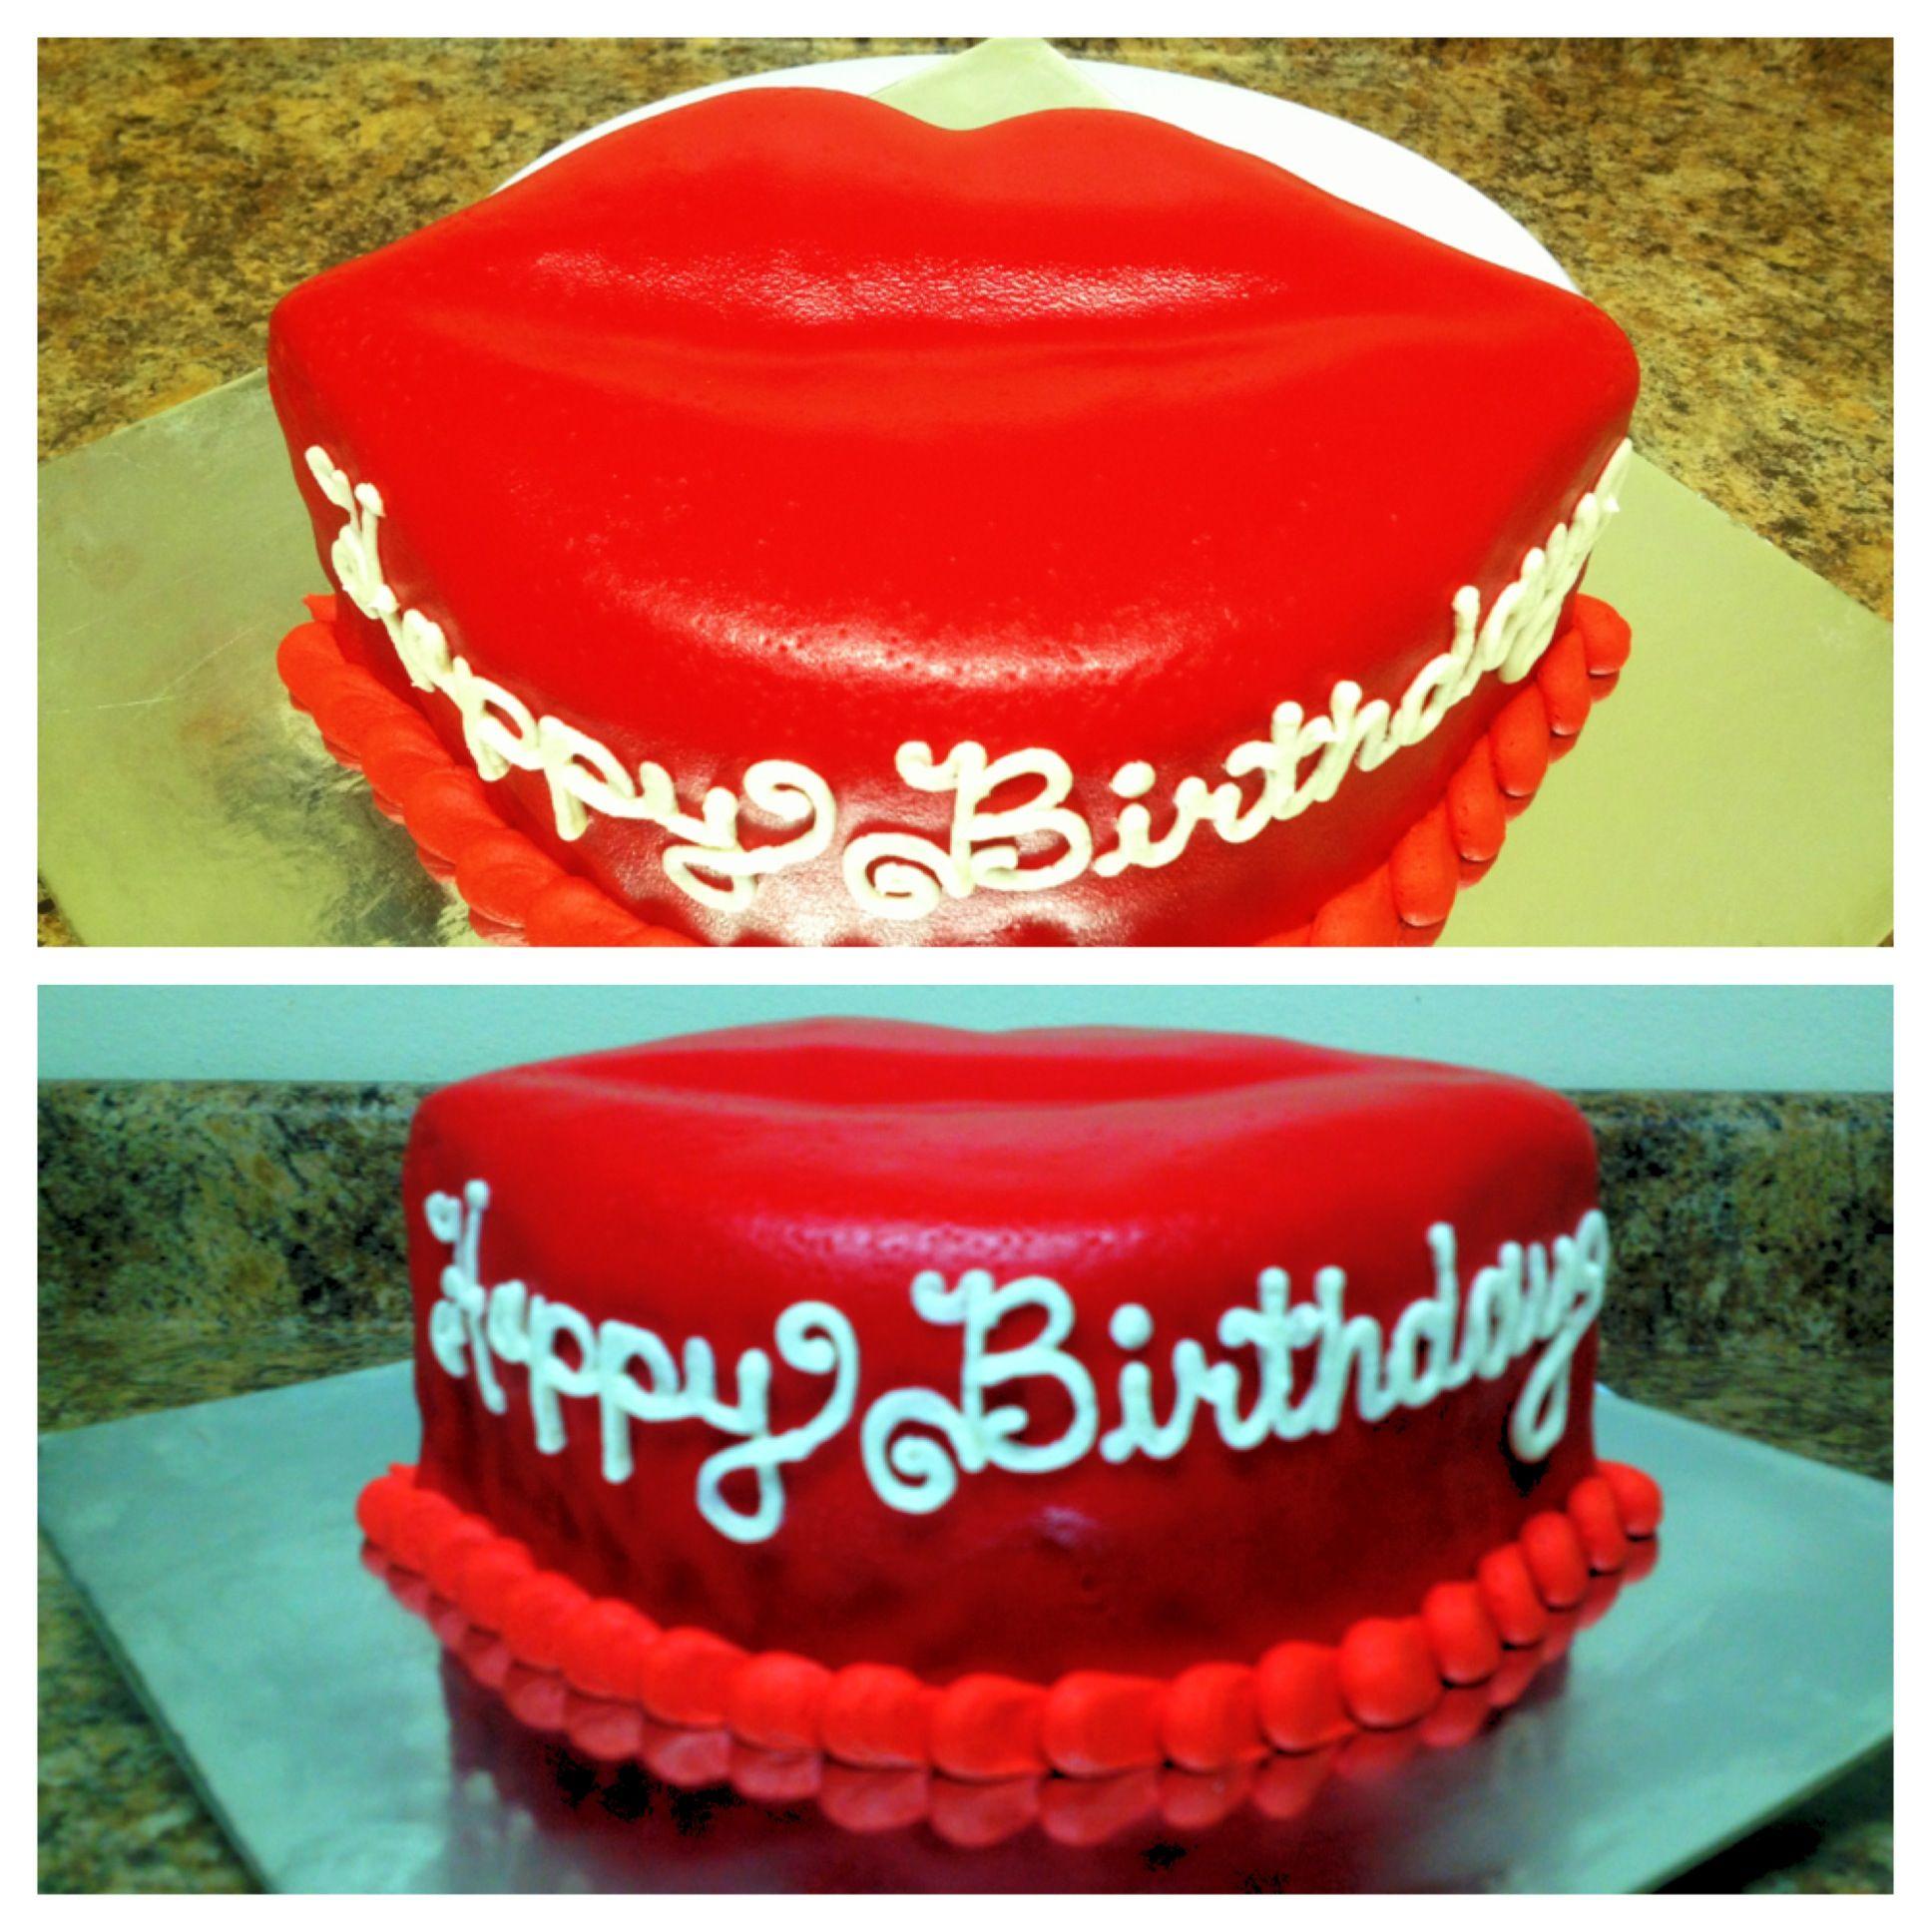 Lips Cake Cake Dulces Creations Pinterest Lips Cake And Cake